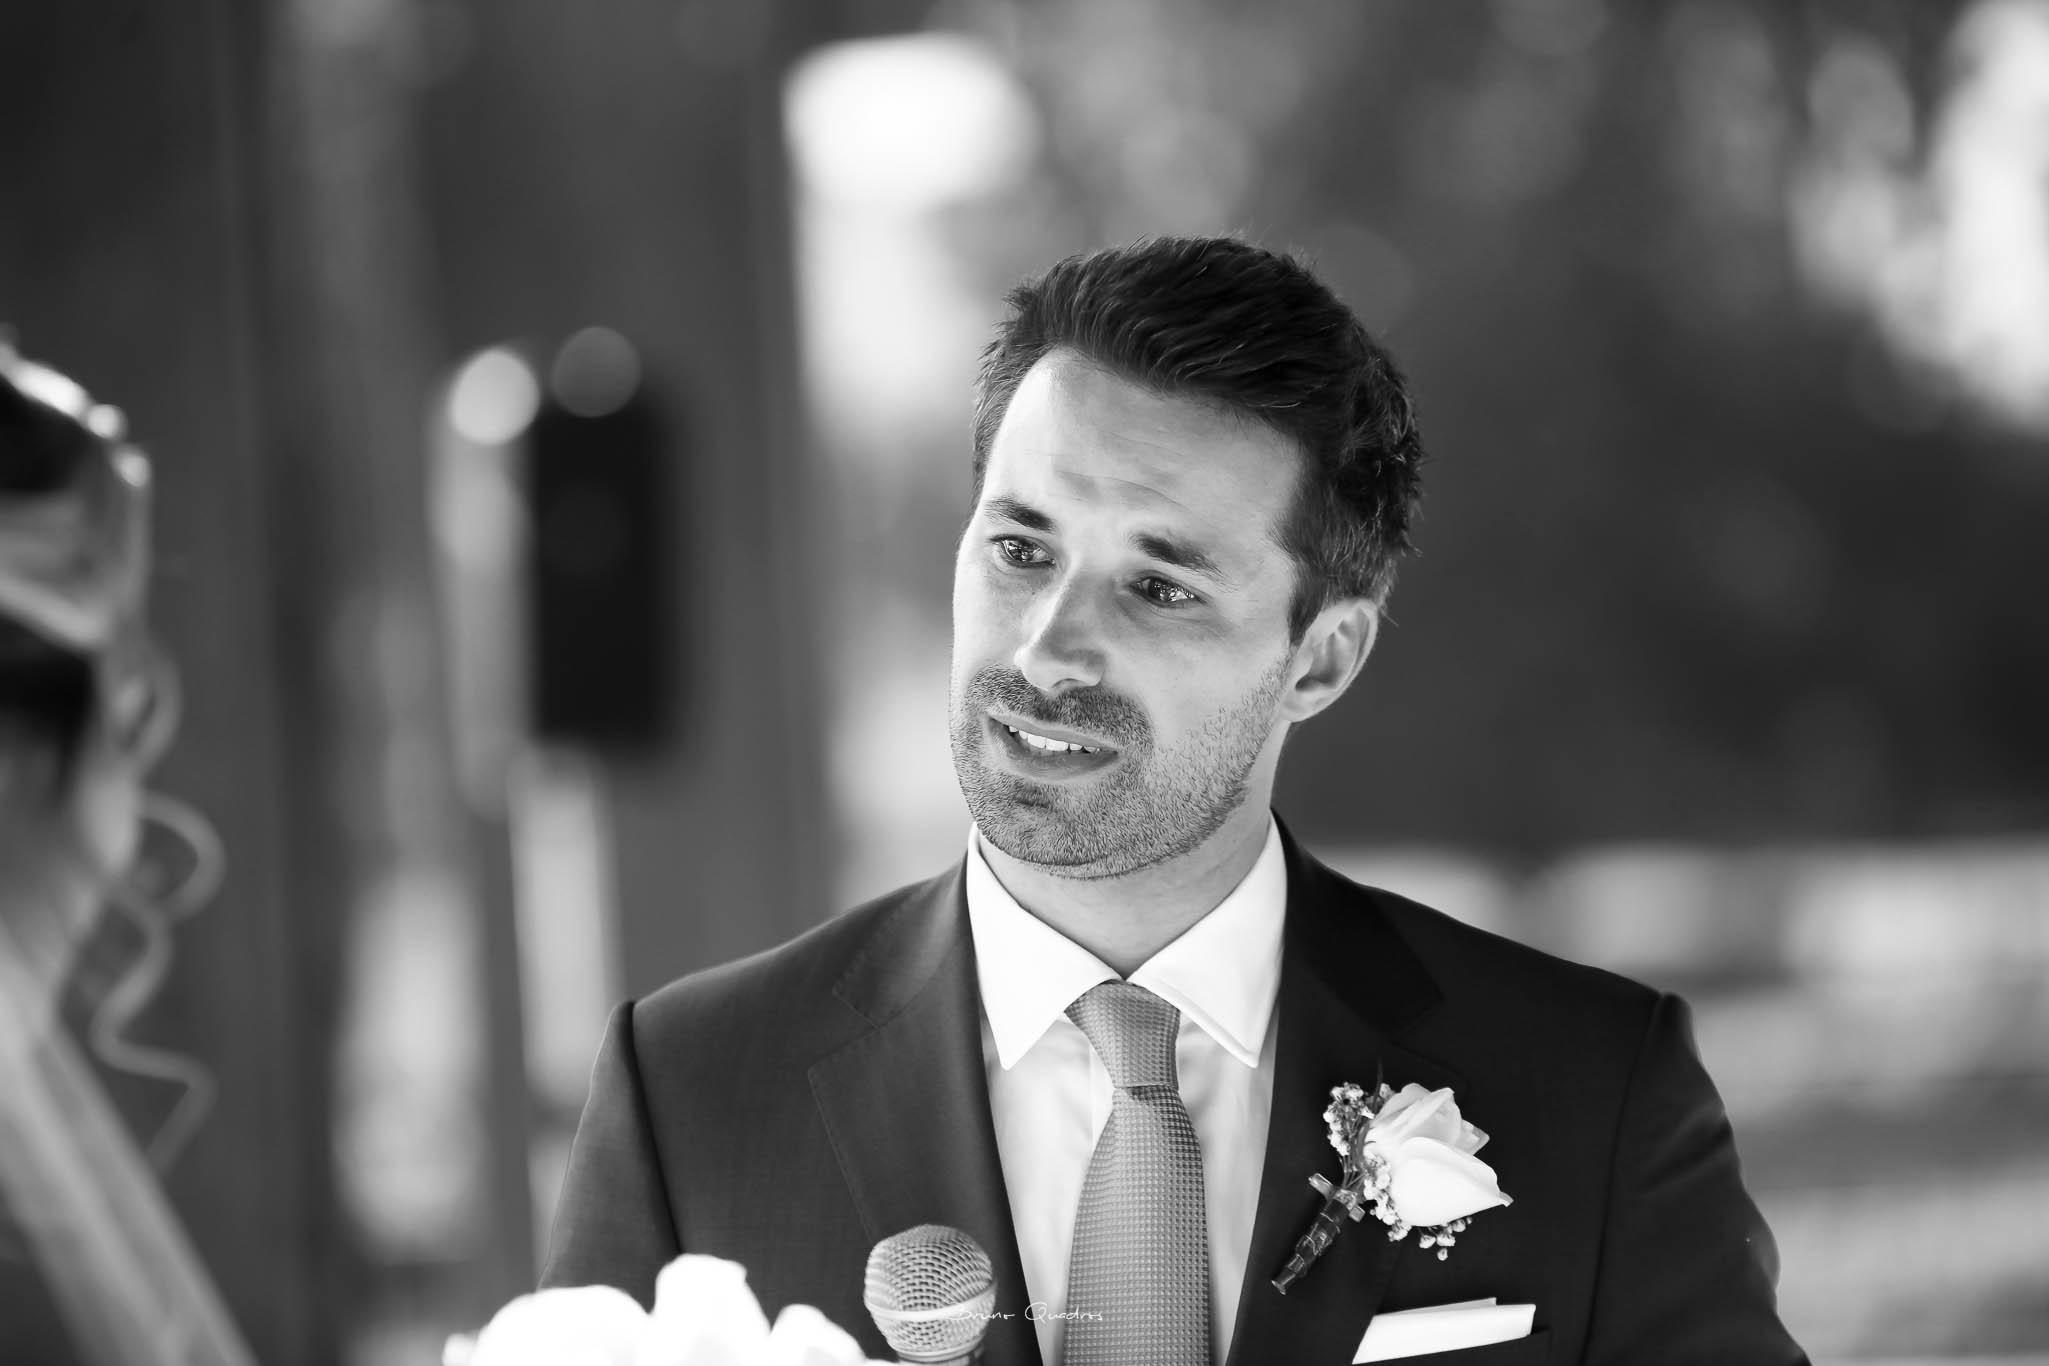 Contate Wedding Photographer/Fotografo de Casamento Viseu/Melhor fotografo de casamento/Batizado/Familia